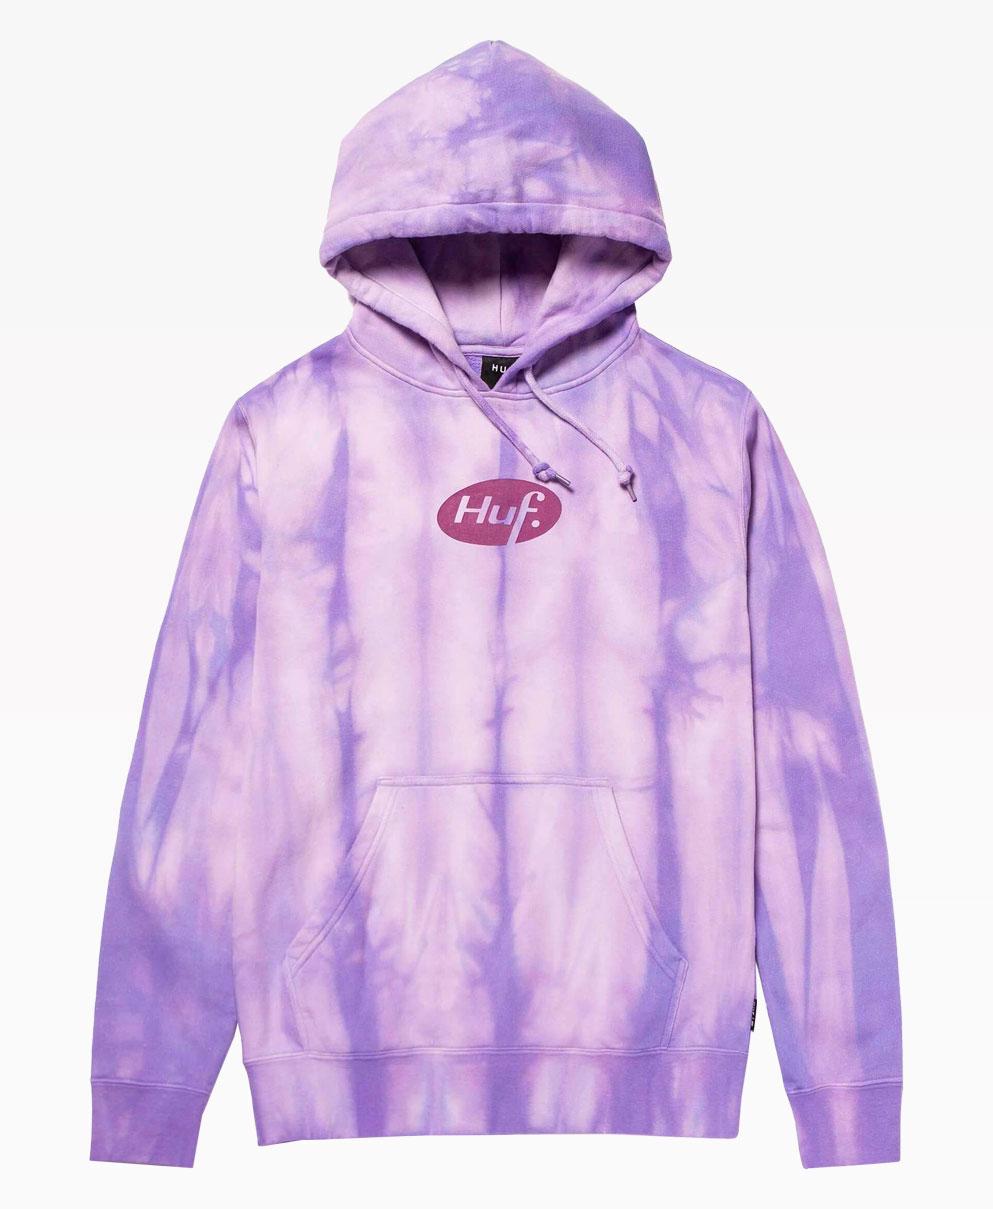 Huf Relax Tie Dye Hoodie Violet Front